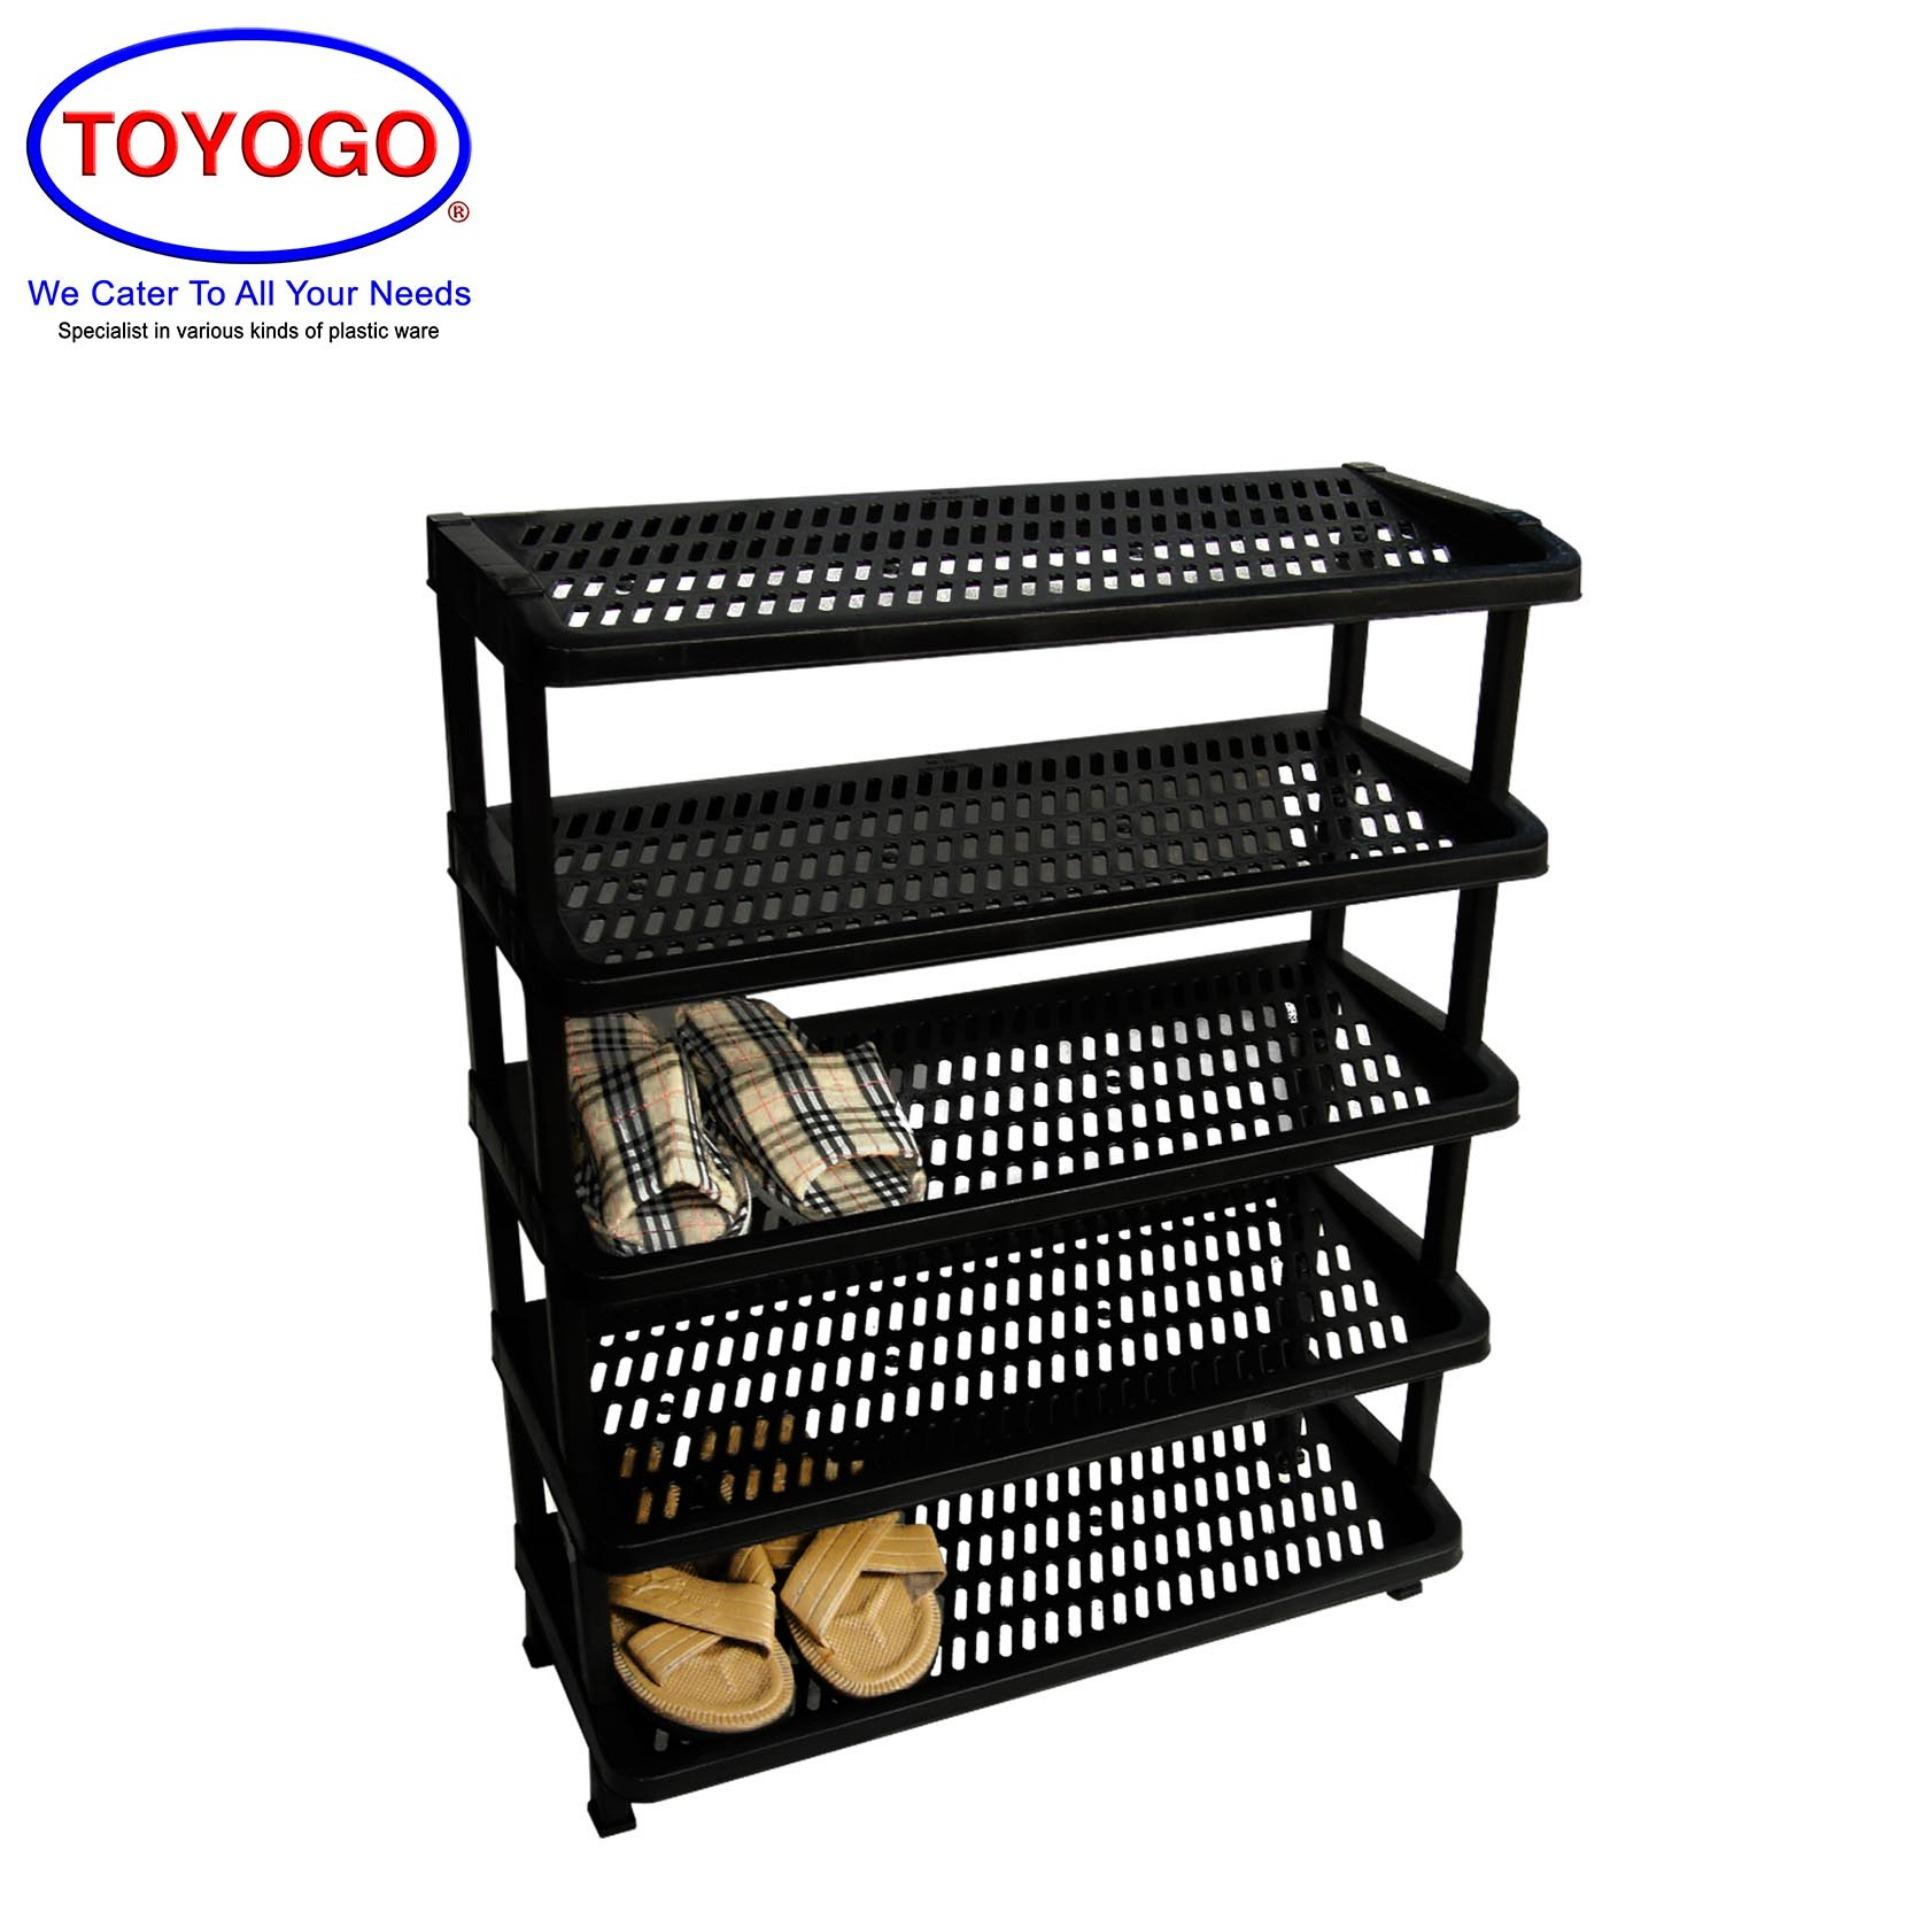 Toyogo 5 Tier Plastic Shoe Rack [342-5]